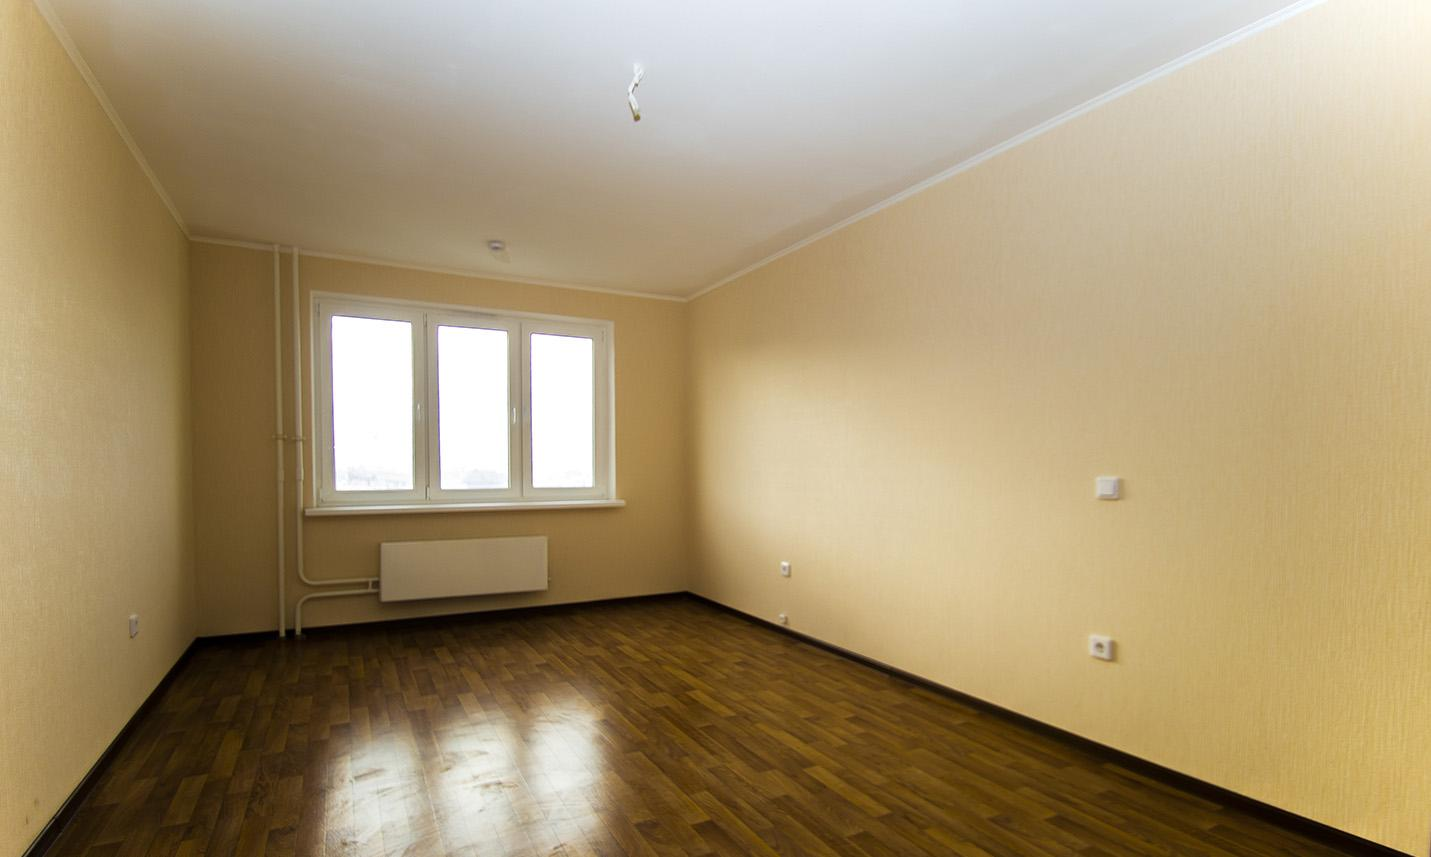 2-к квартира   Краснодар, Рождественская Набережная, р-н ЮМР, 37 фото - 1